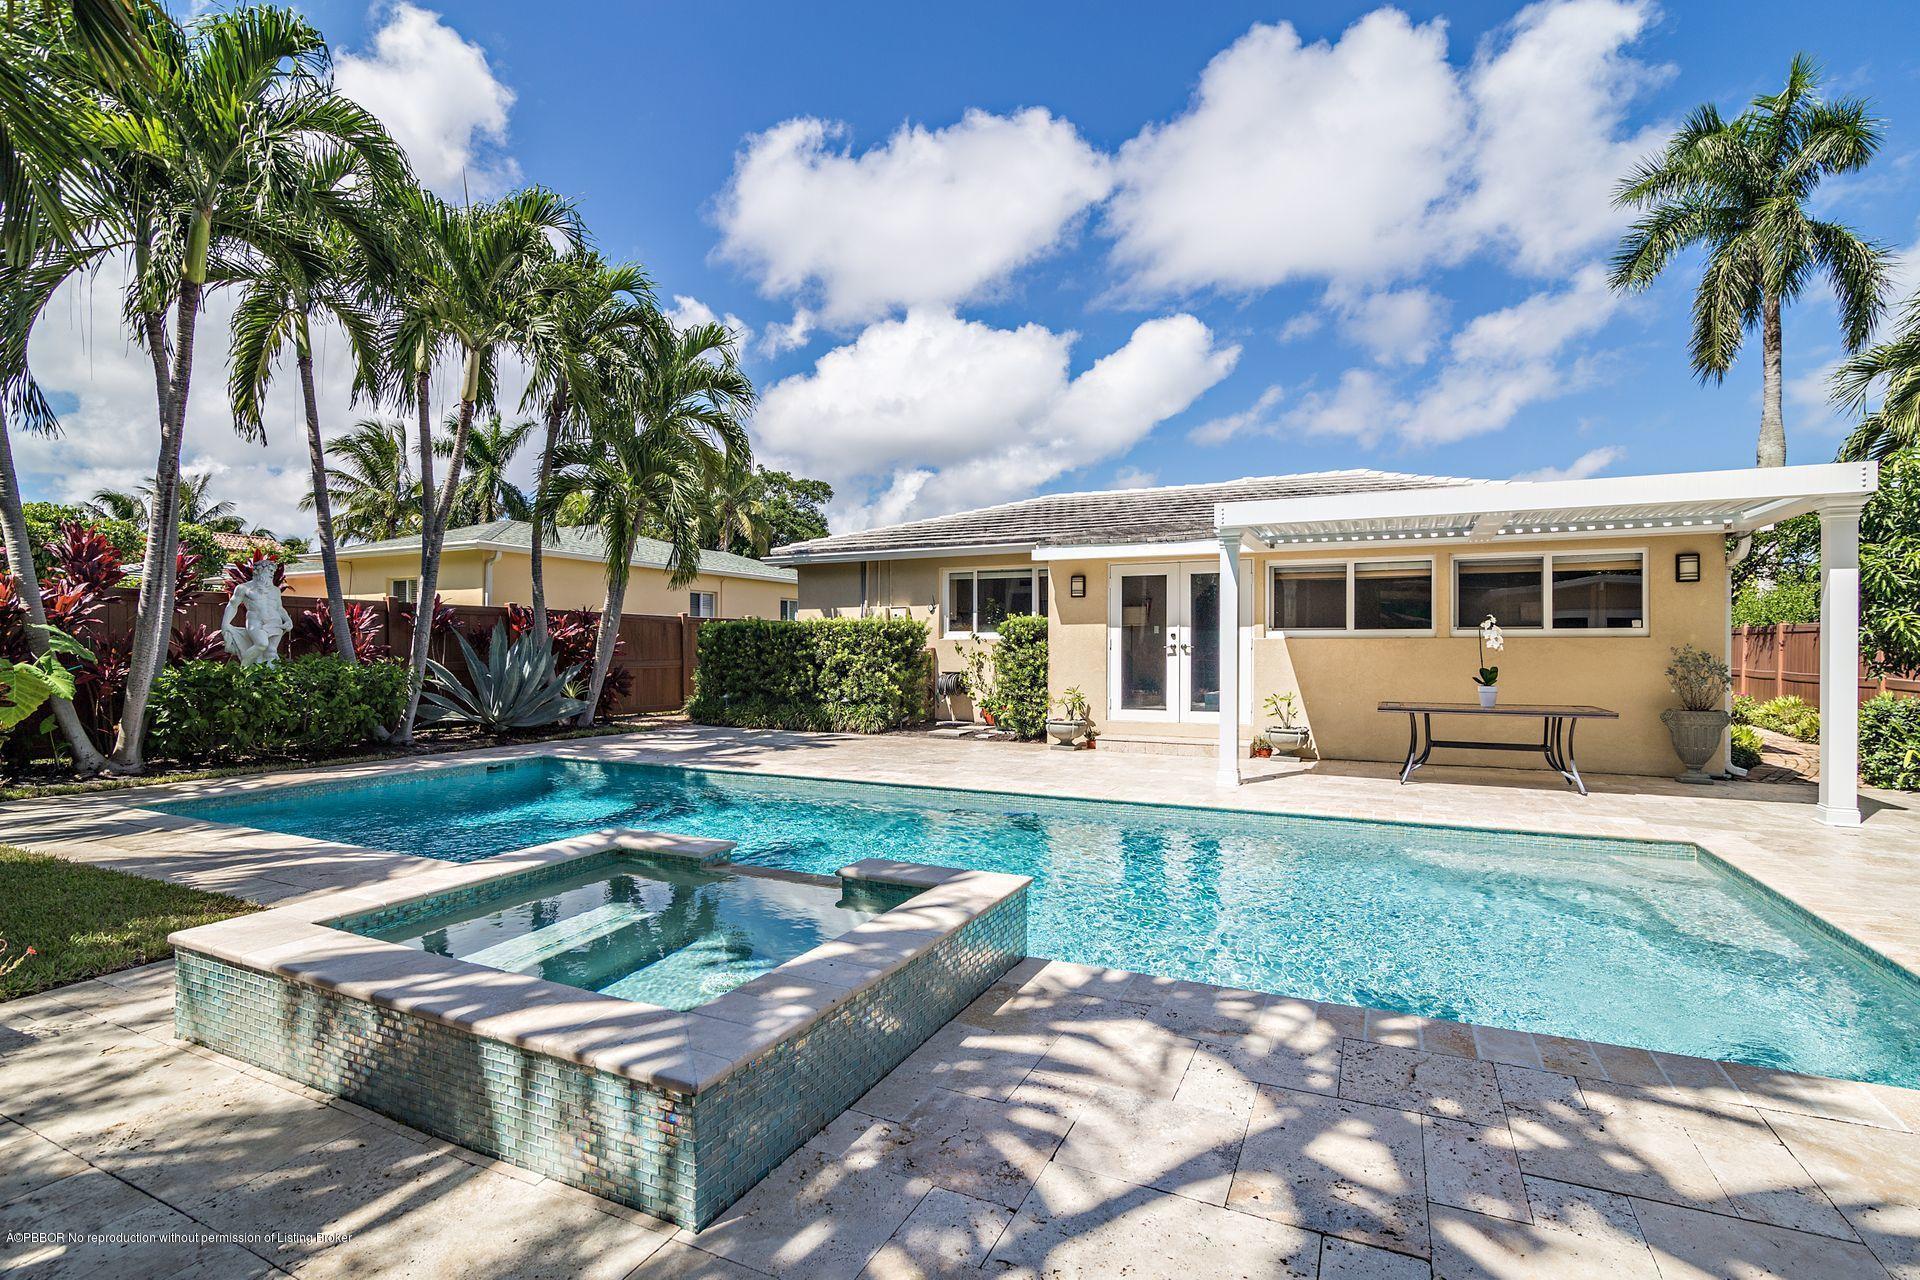 310 Murray Road - West Palm Beach, Florida